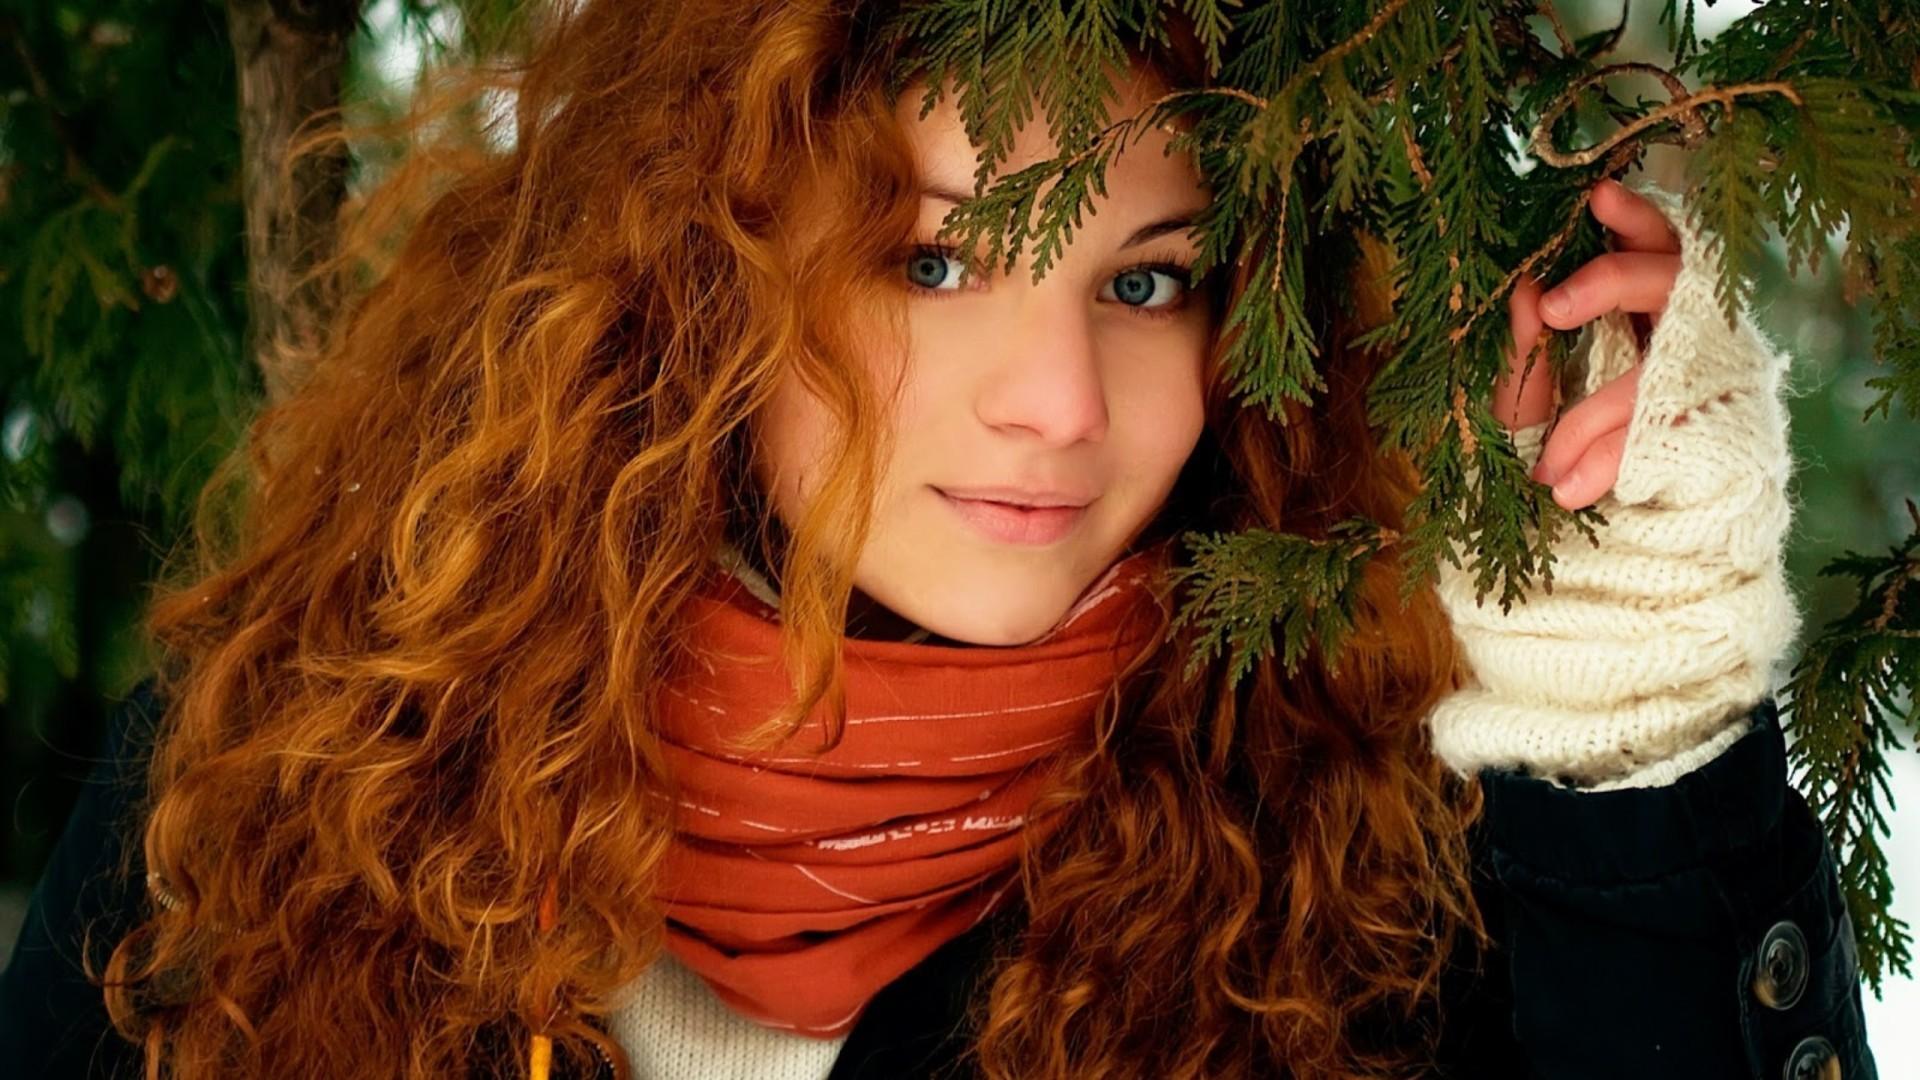 Red Head Girl Holding Branch